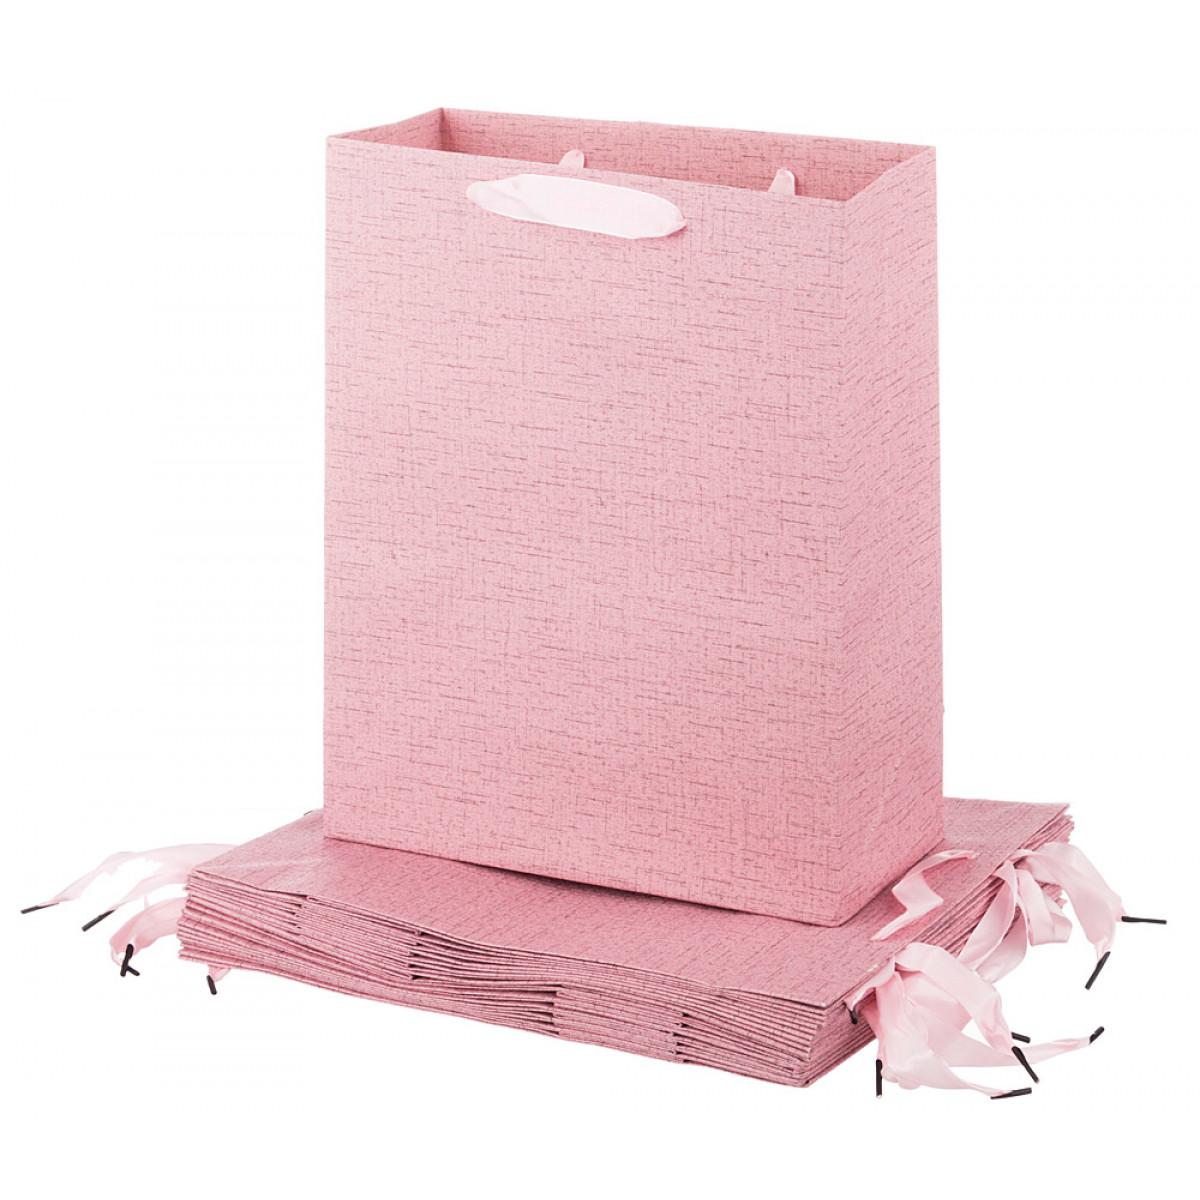 {} Lefard Пакет подарочный Linda  (12х26х32 см - 12 шт) magic time подарочный пакет новогодняя лампа 26 32 4 12 7 см